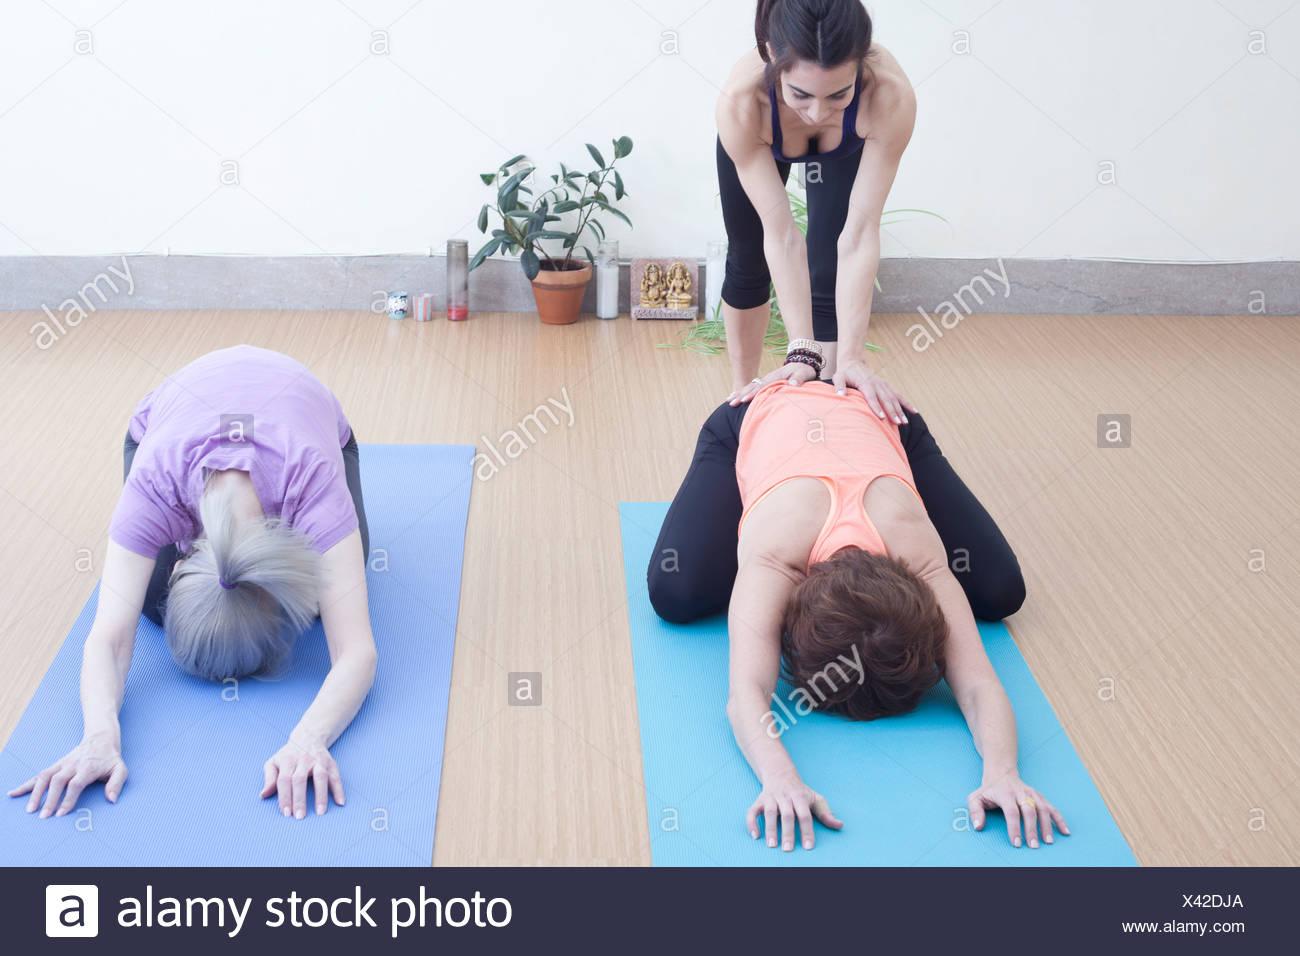 Women in child's pose - Stock Image